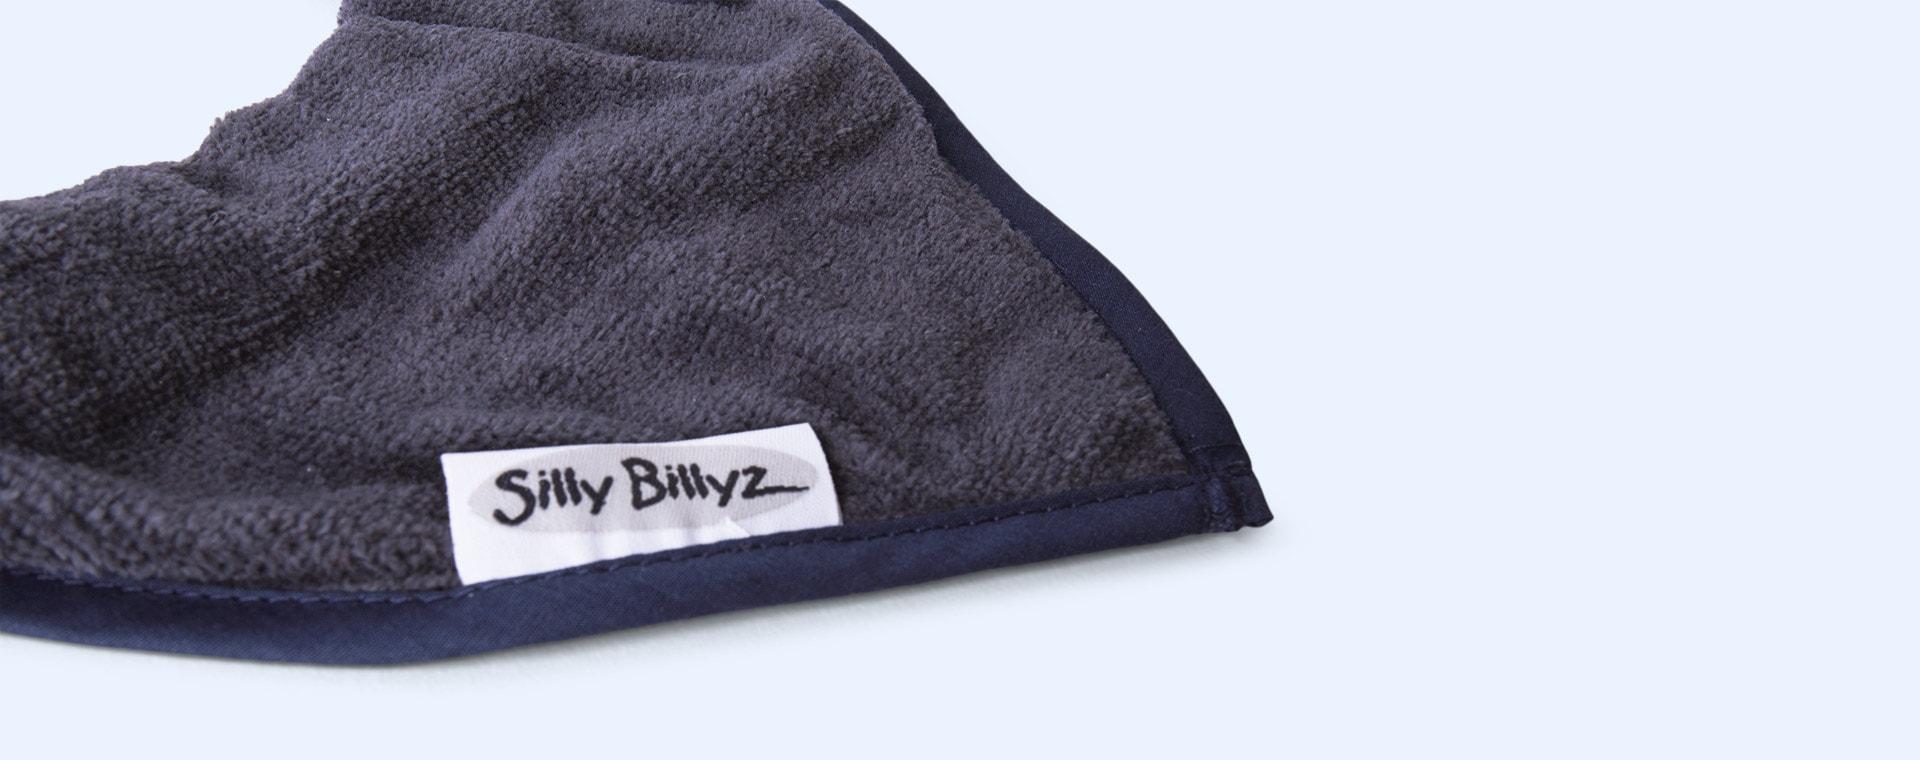 Navy Silly Billyz Bandana Bib